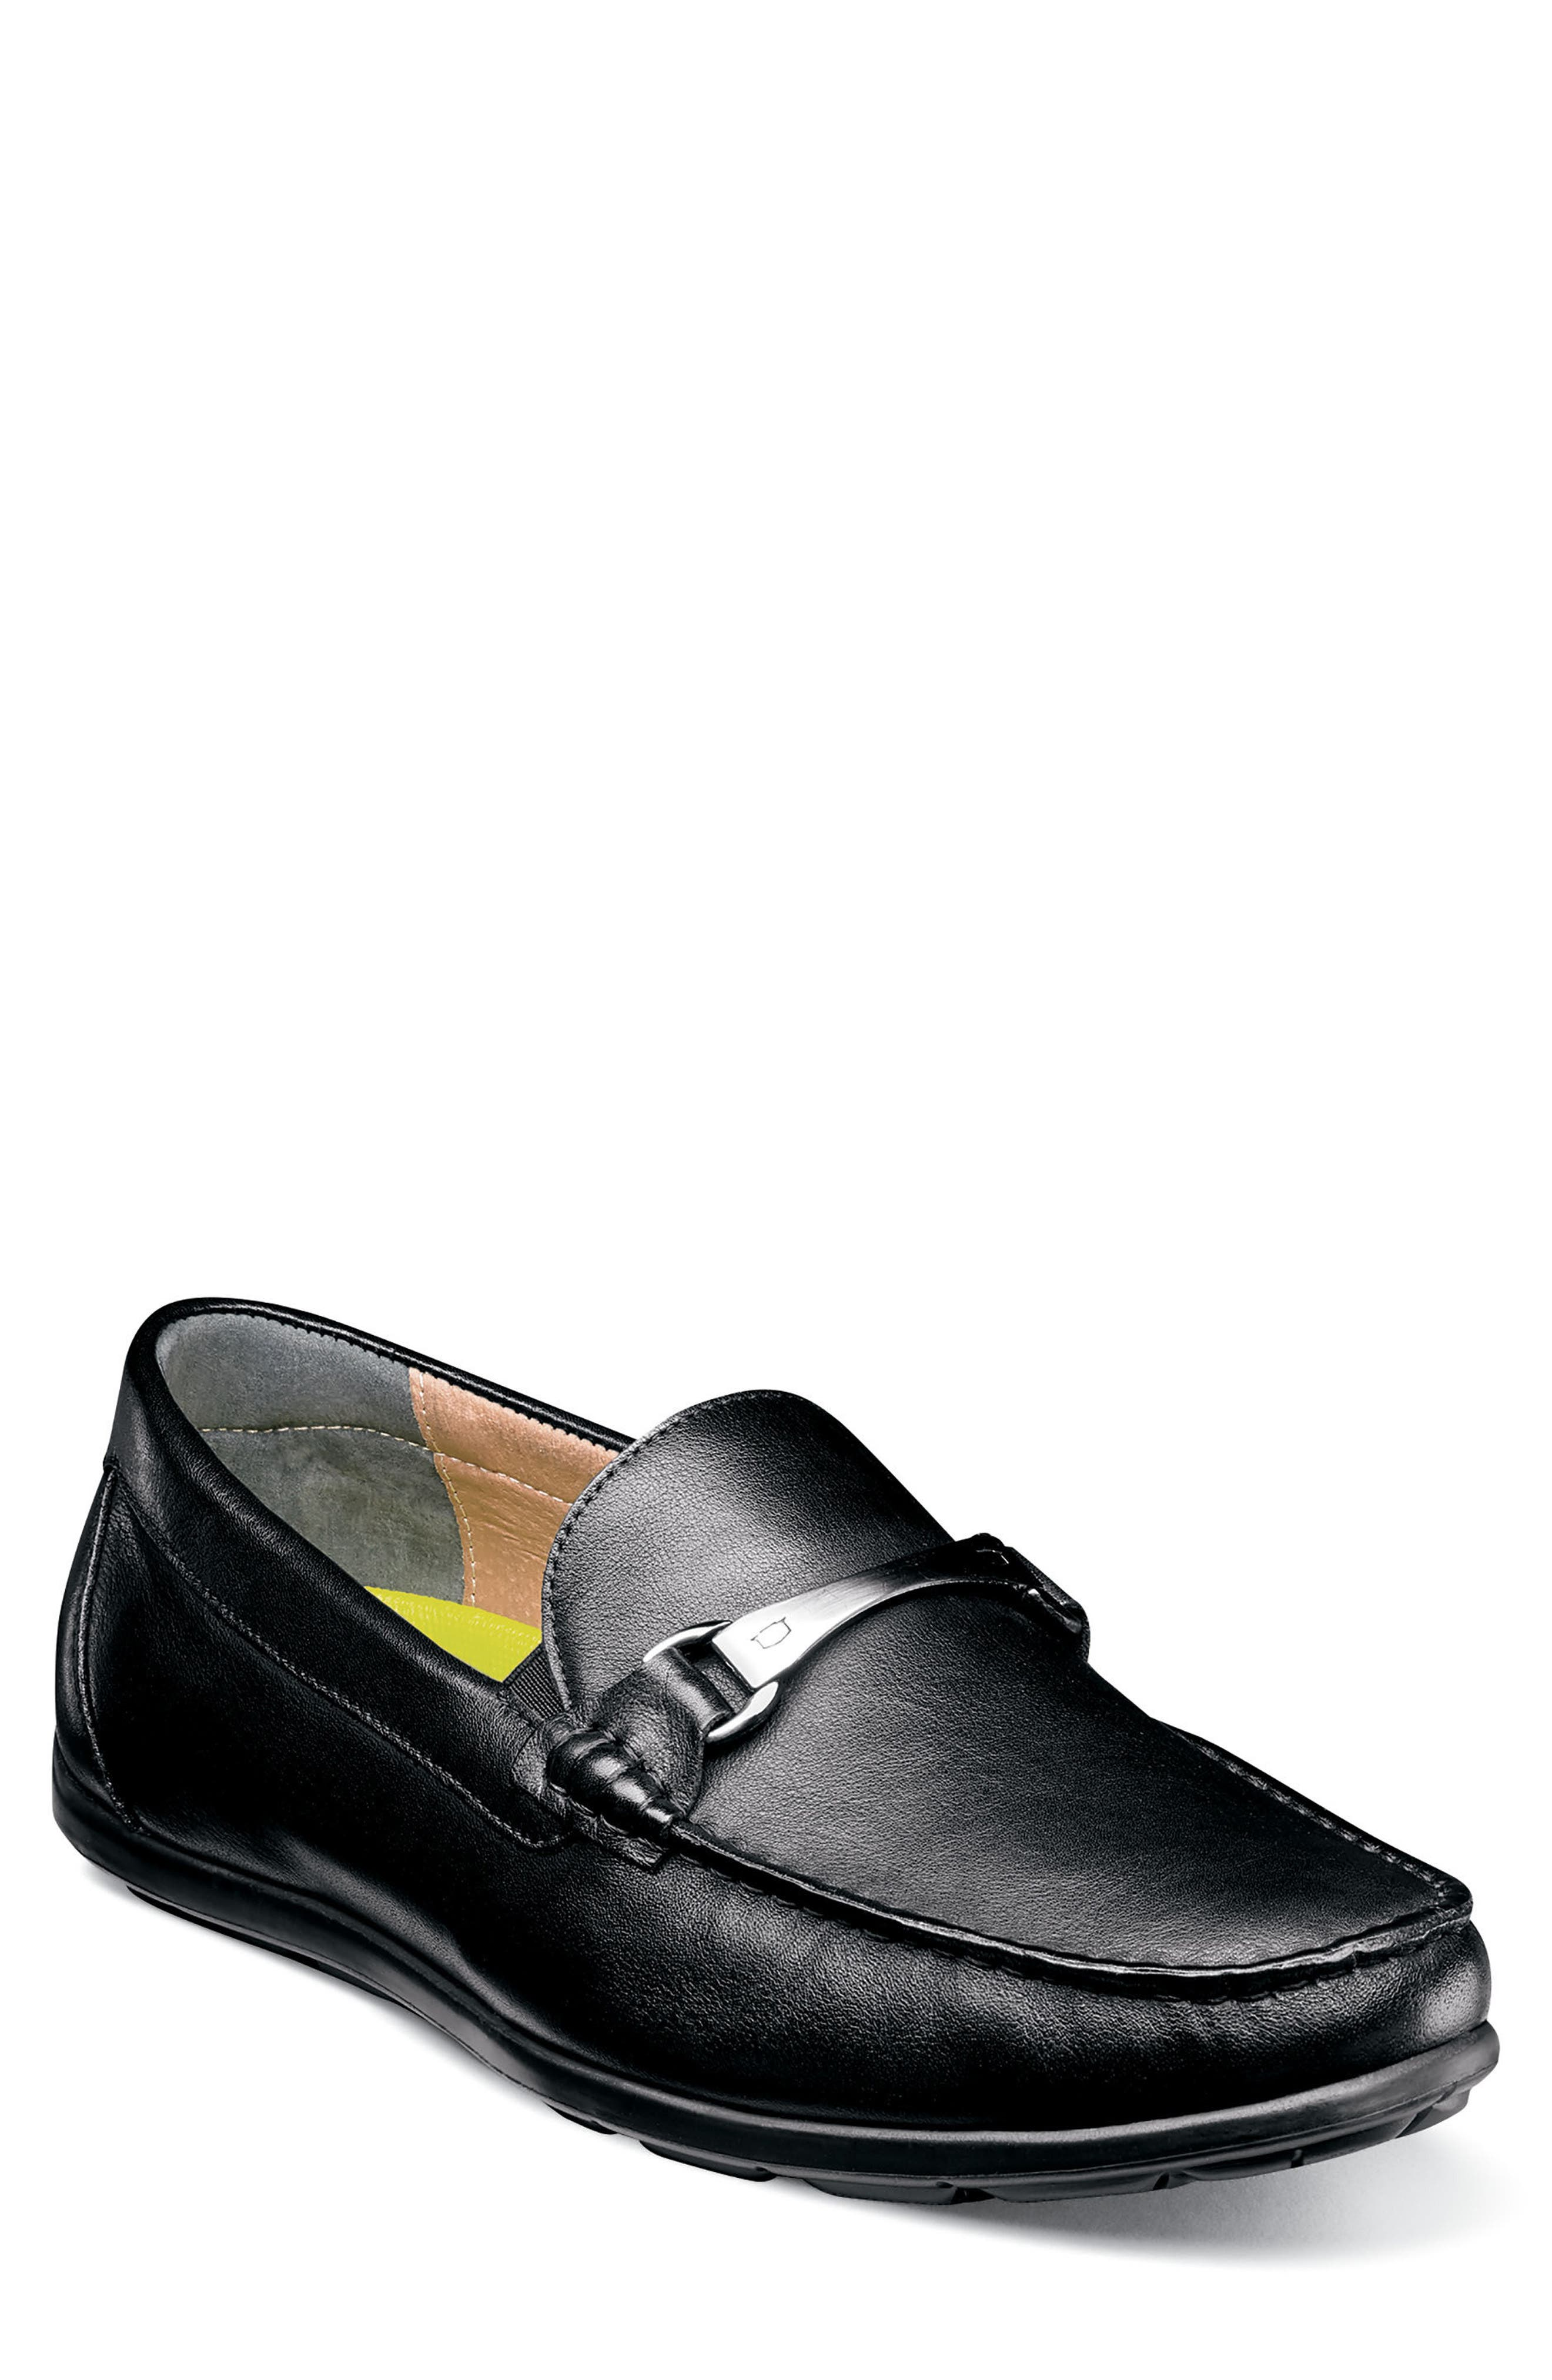 Comfortech Bit Loafer,                         Main,                         color, 001